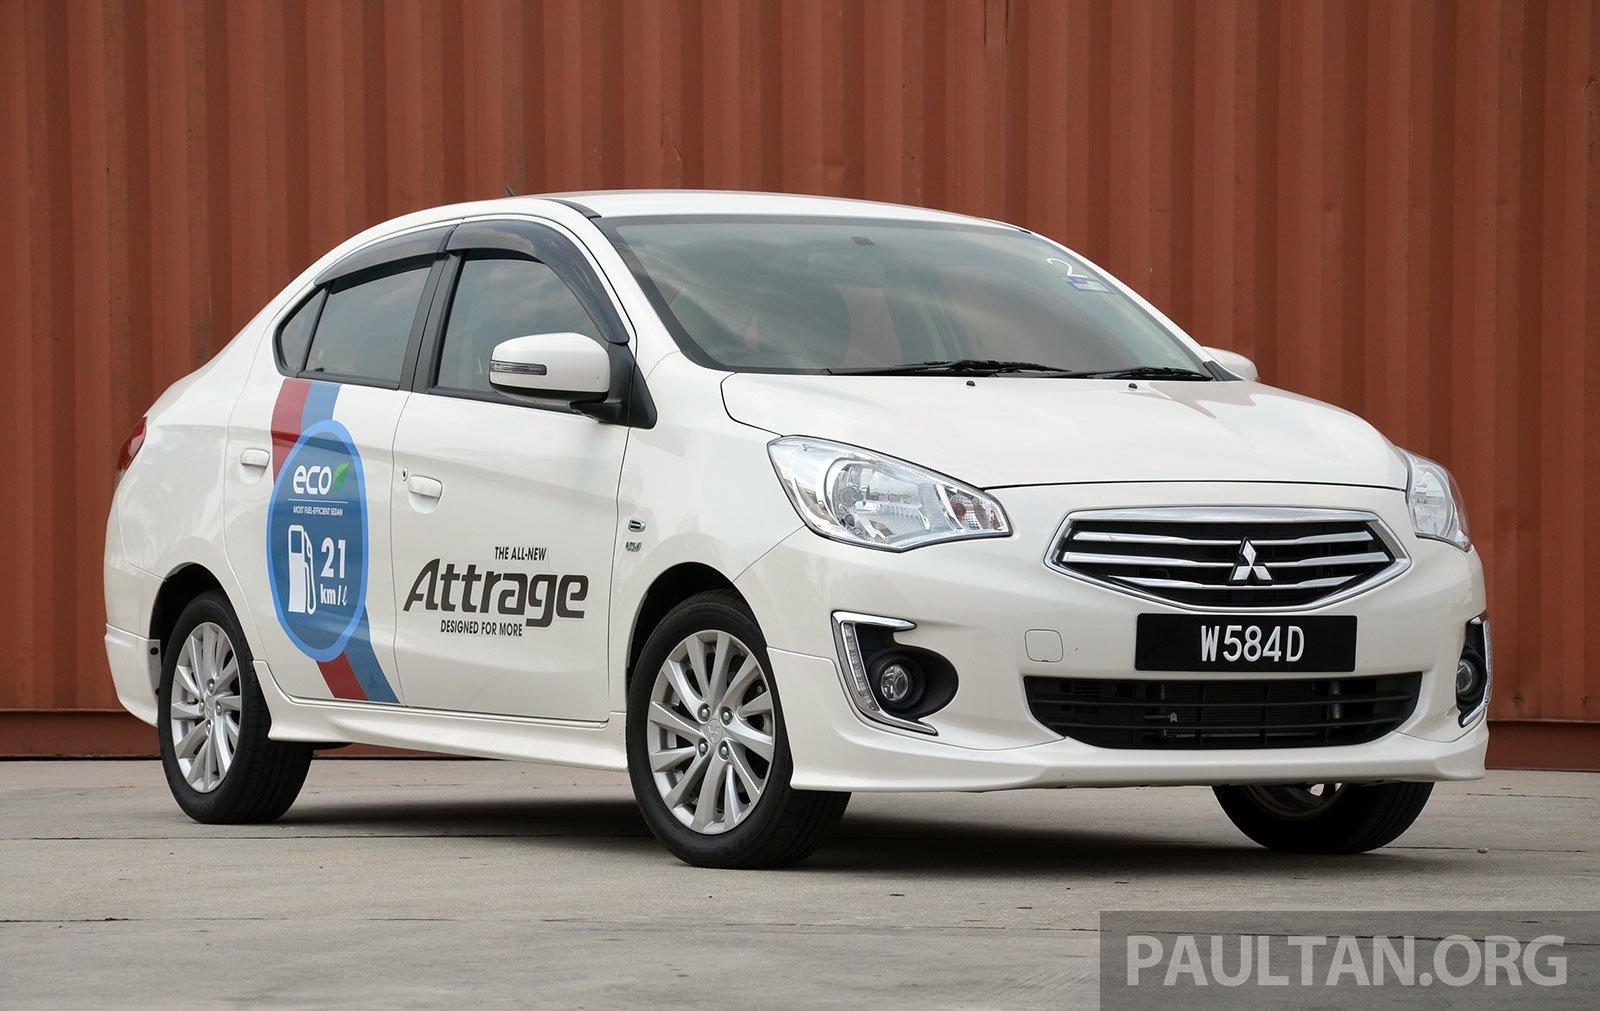 Driven Mitsubishi Attrage 21 Km L Claims Put To Test